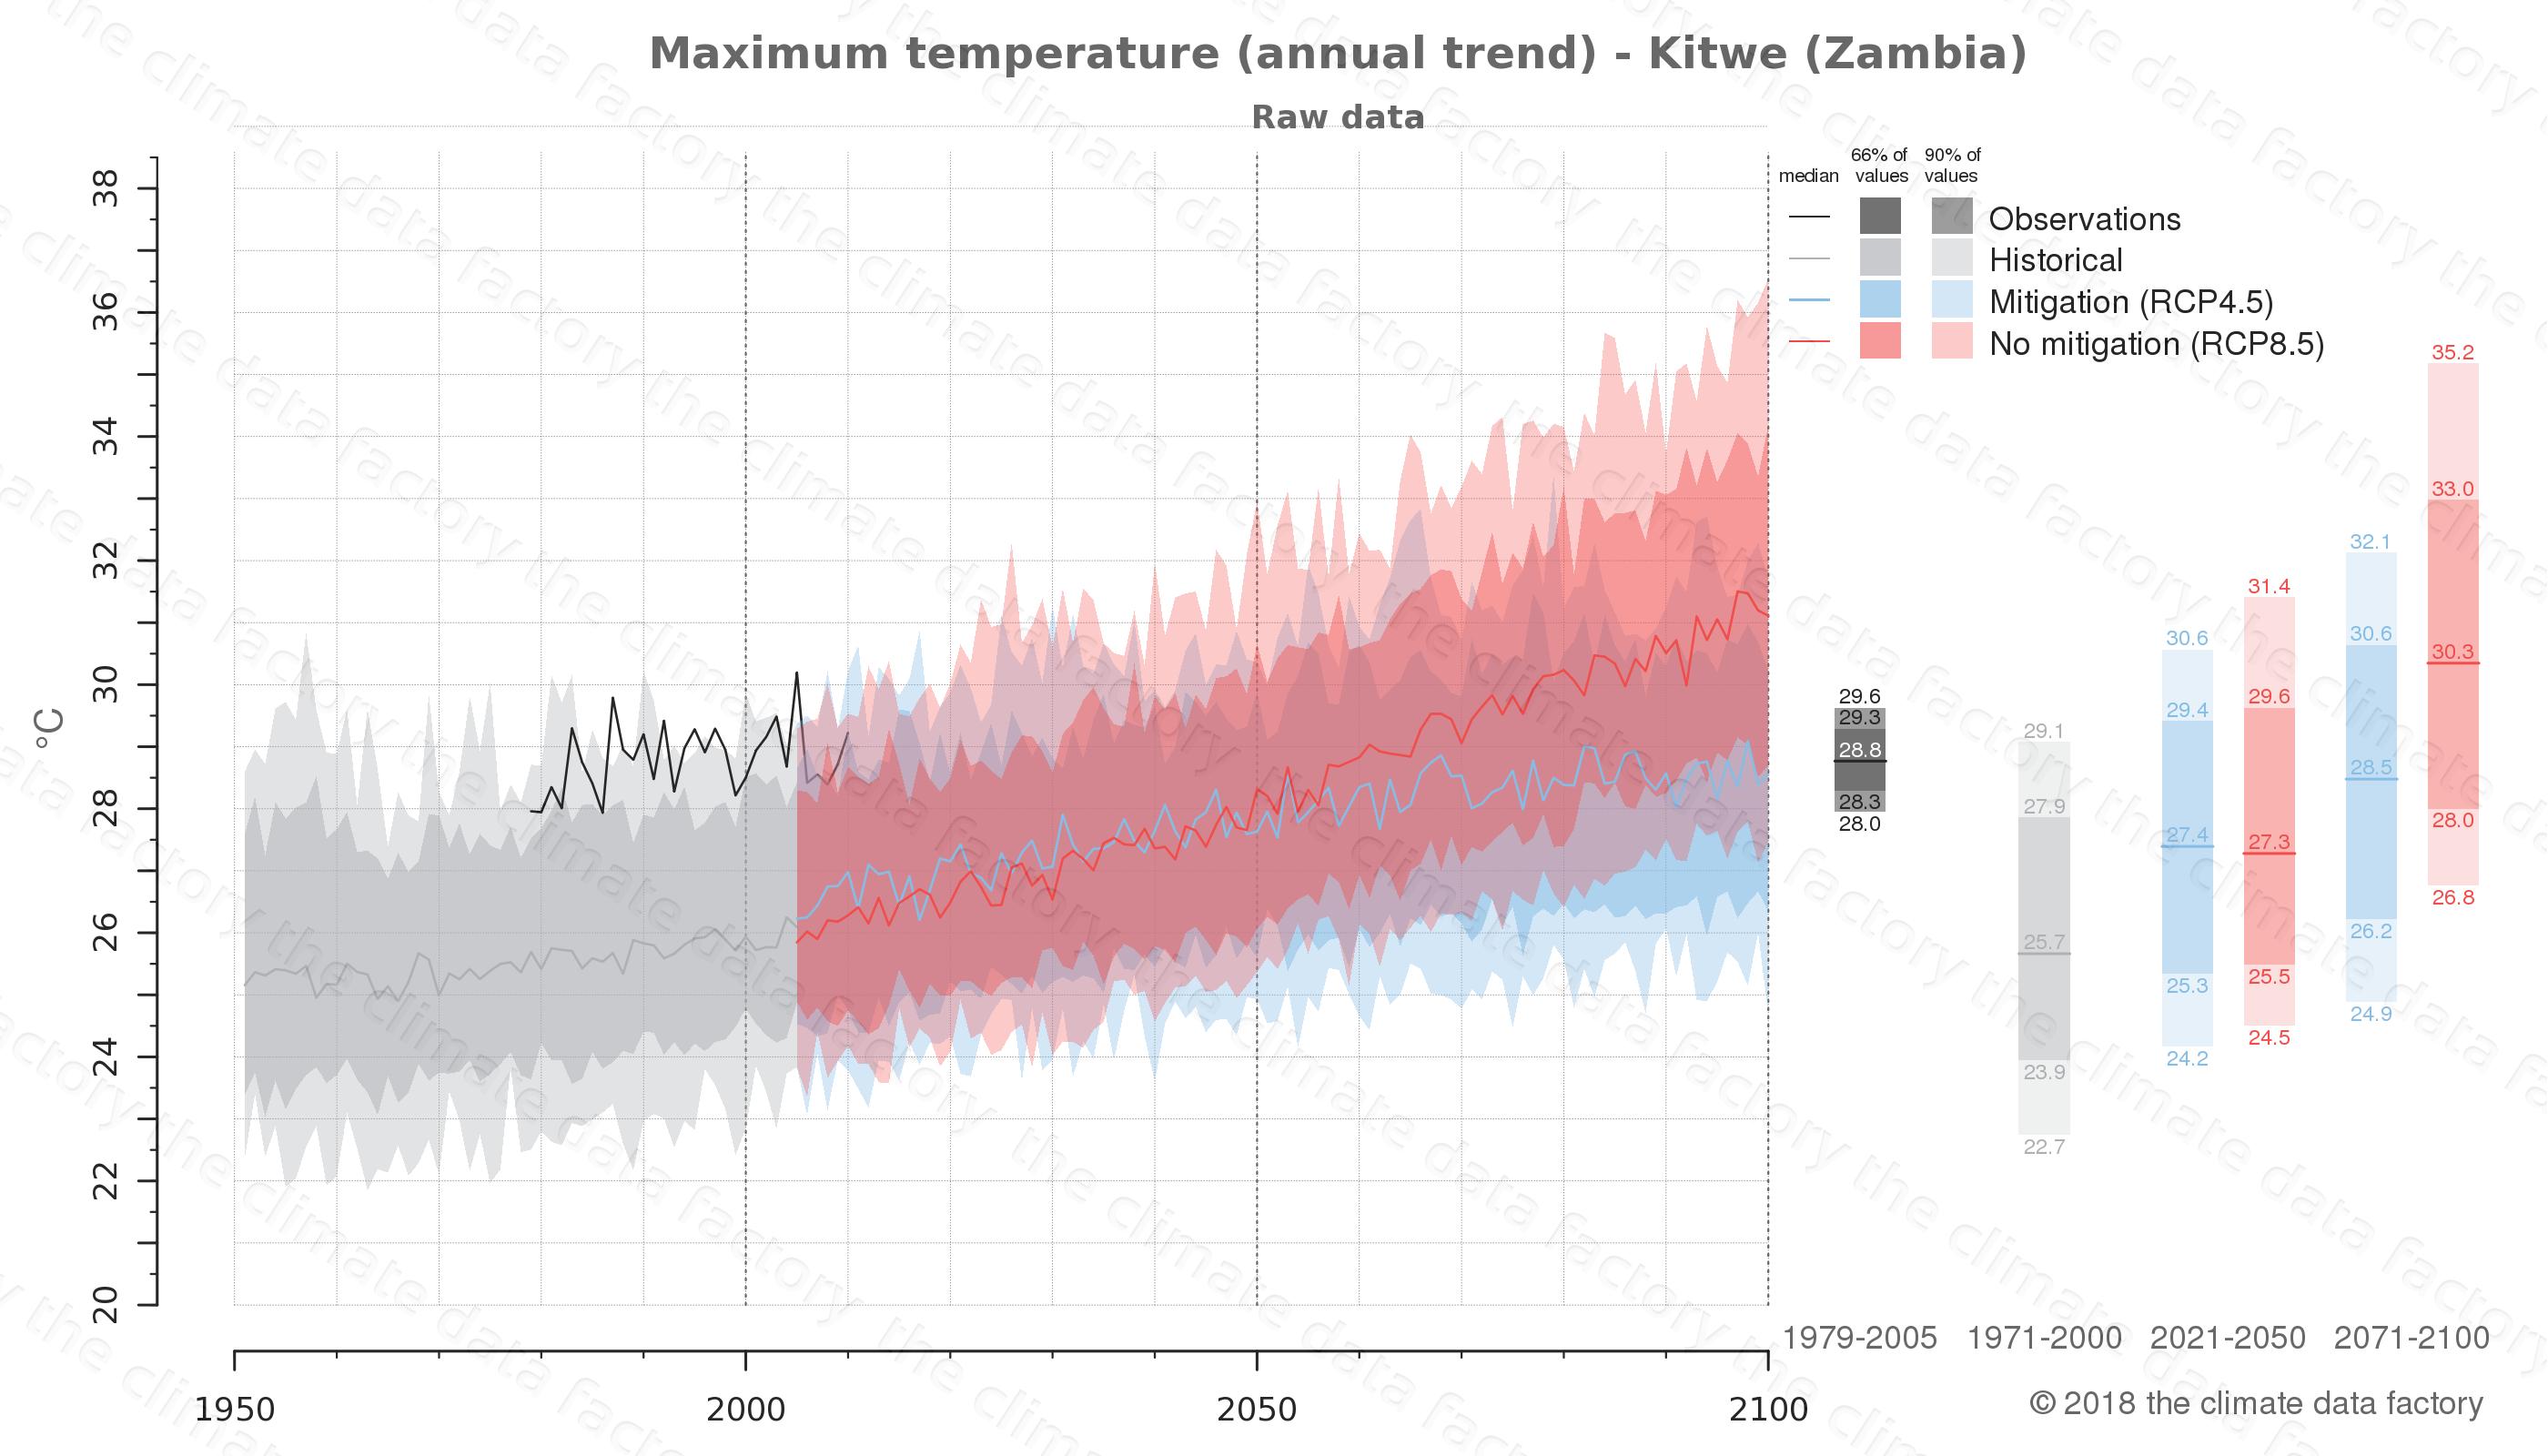 climate change data policy adaptation climate graph city data maximum-temperature kitwe zambia